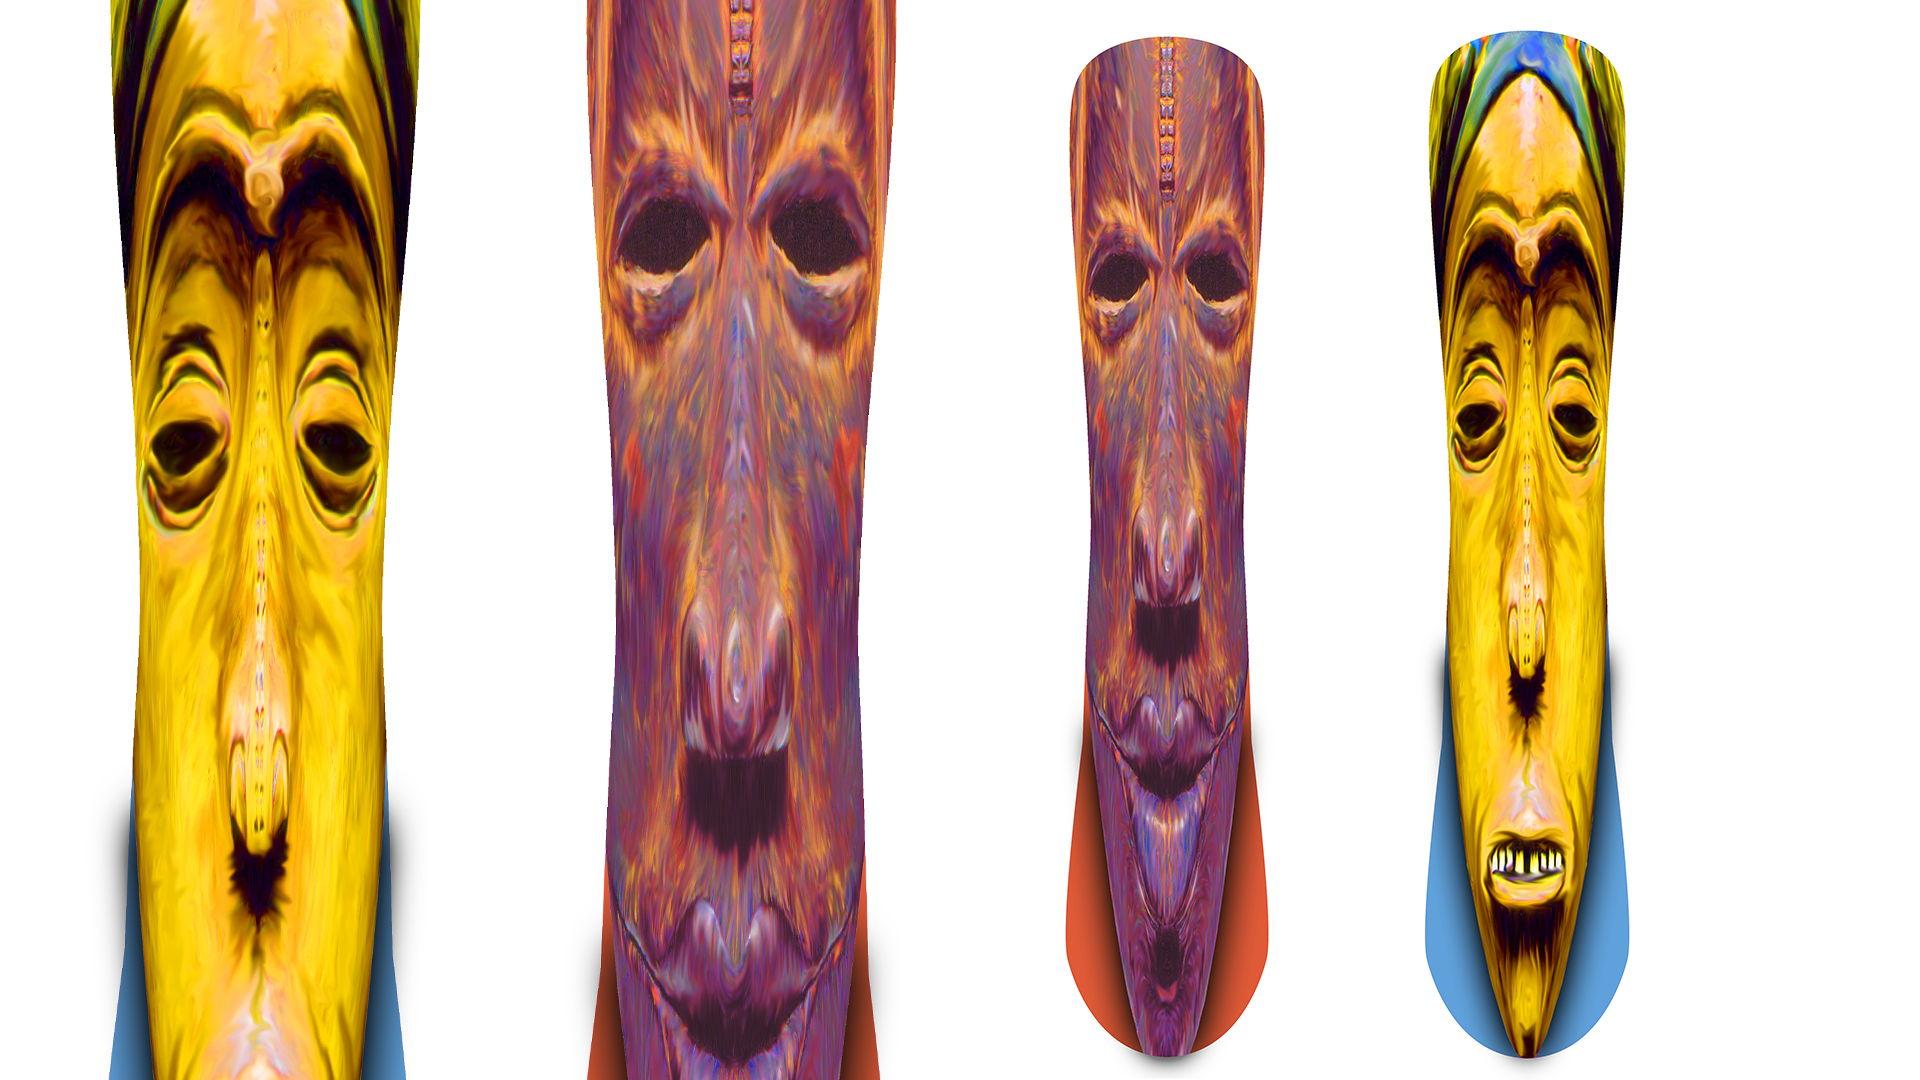 Michael-Russ-GmbH. Snowboards